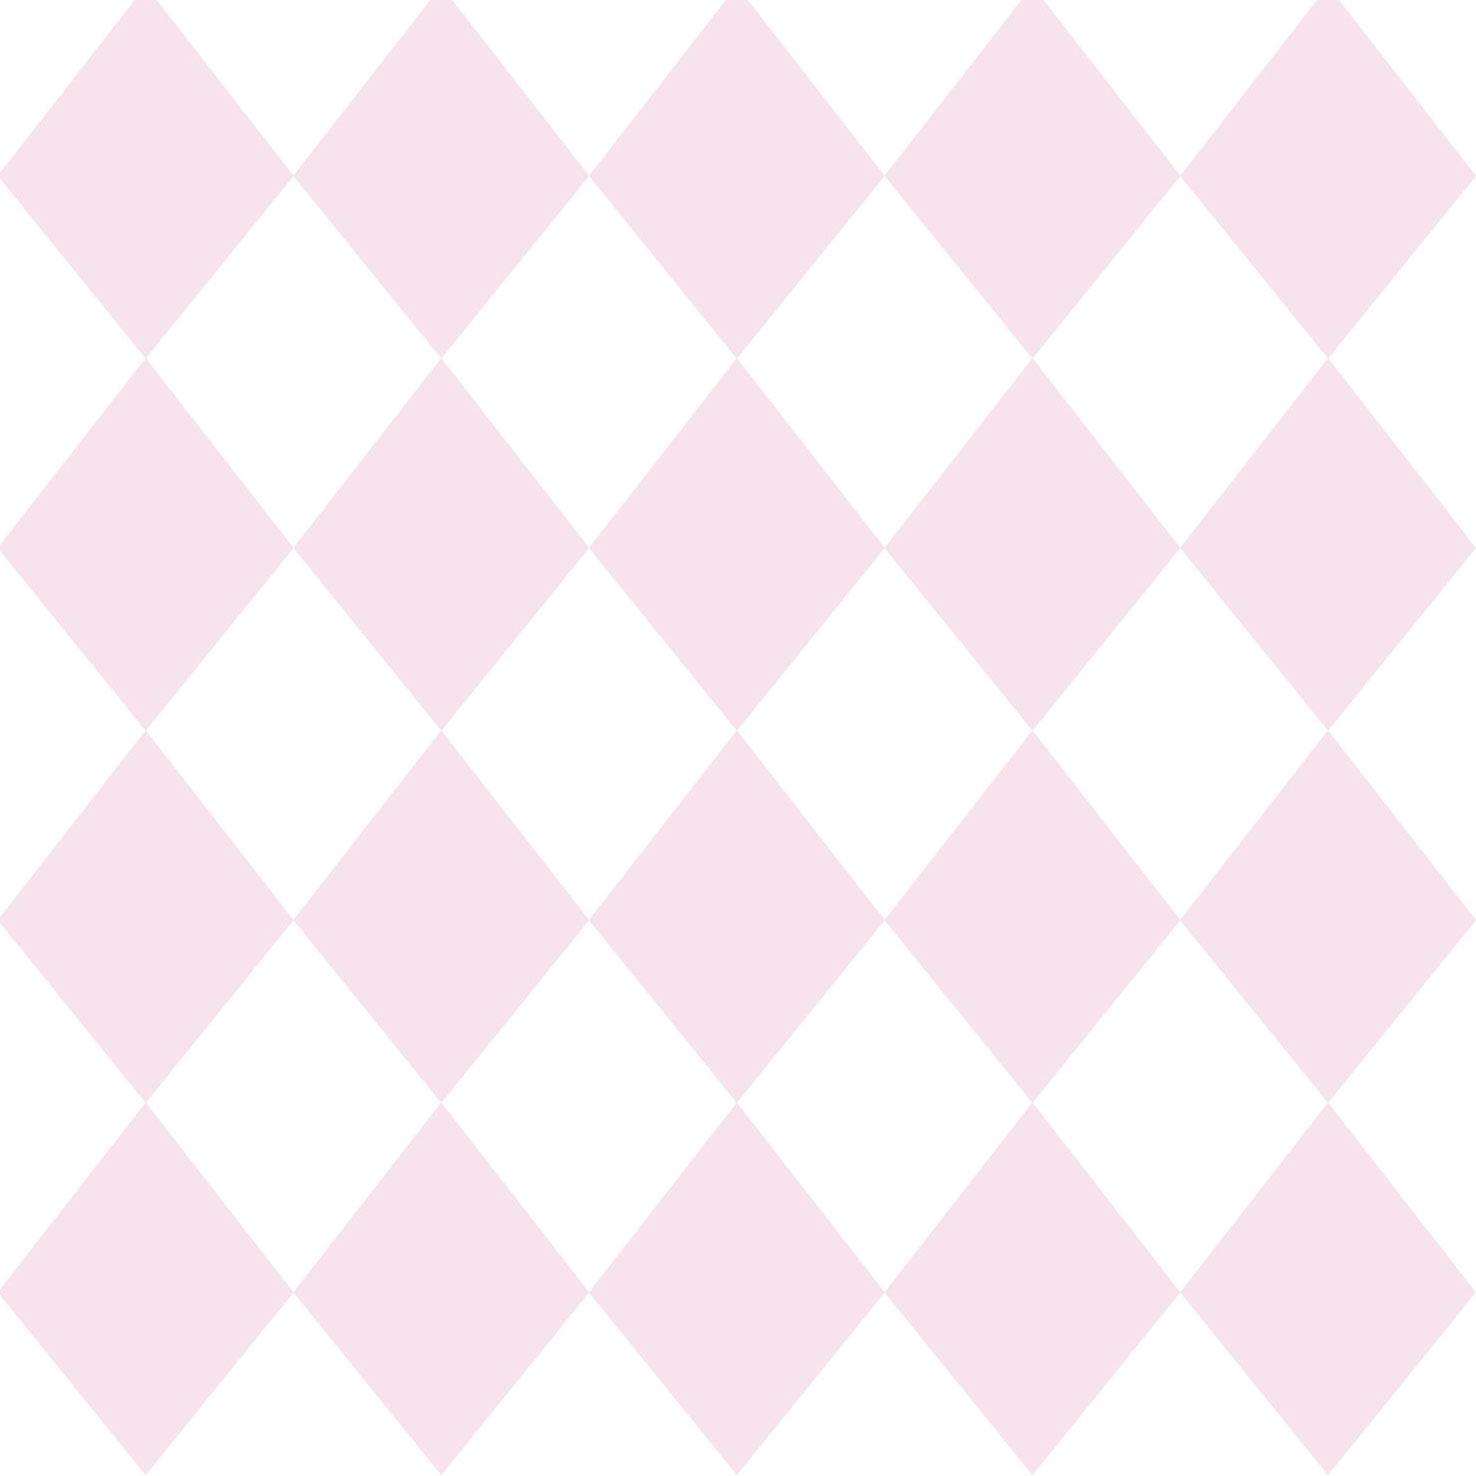 Wallpaper Kids Diamond Rasch Textil Pink White 330211 001